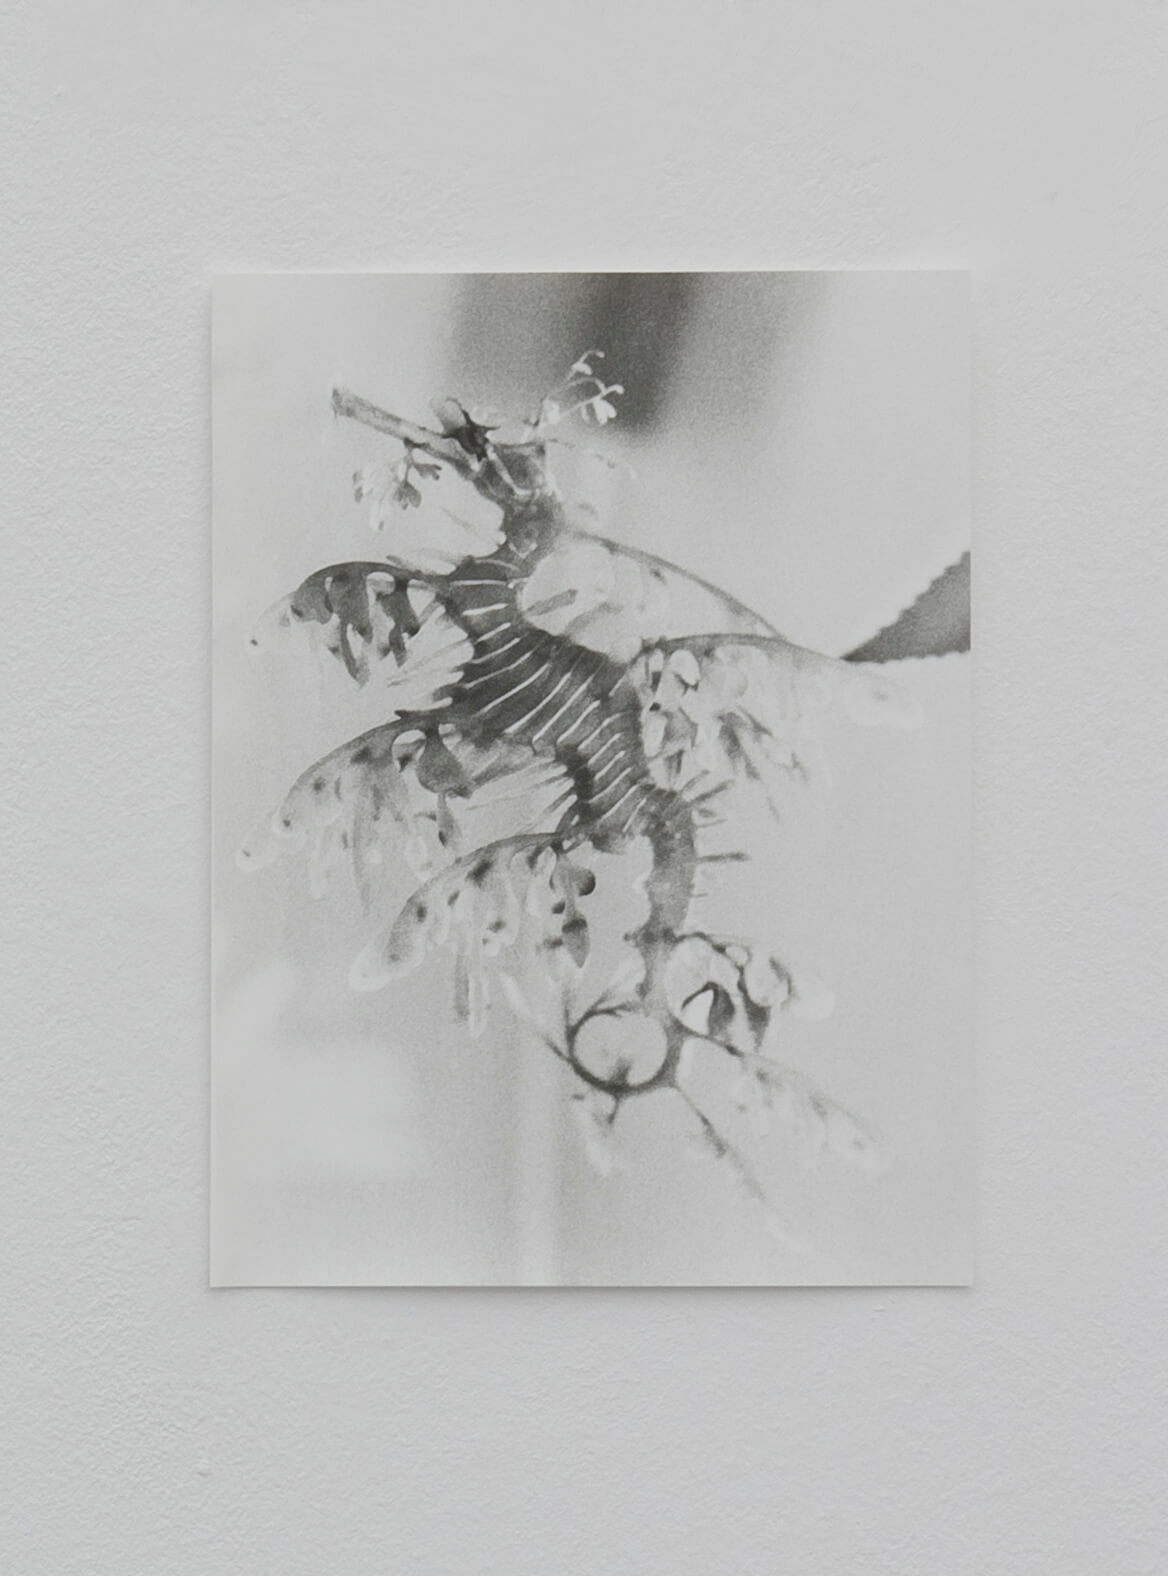 Untitled (Seadragon), 2016 | Zostera & Posidonia | ProjecteSD